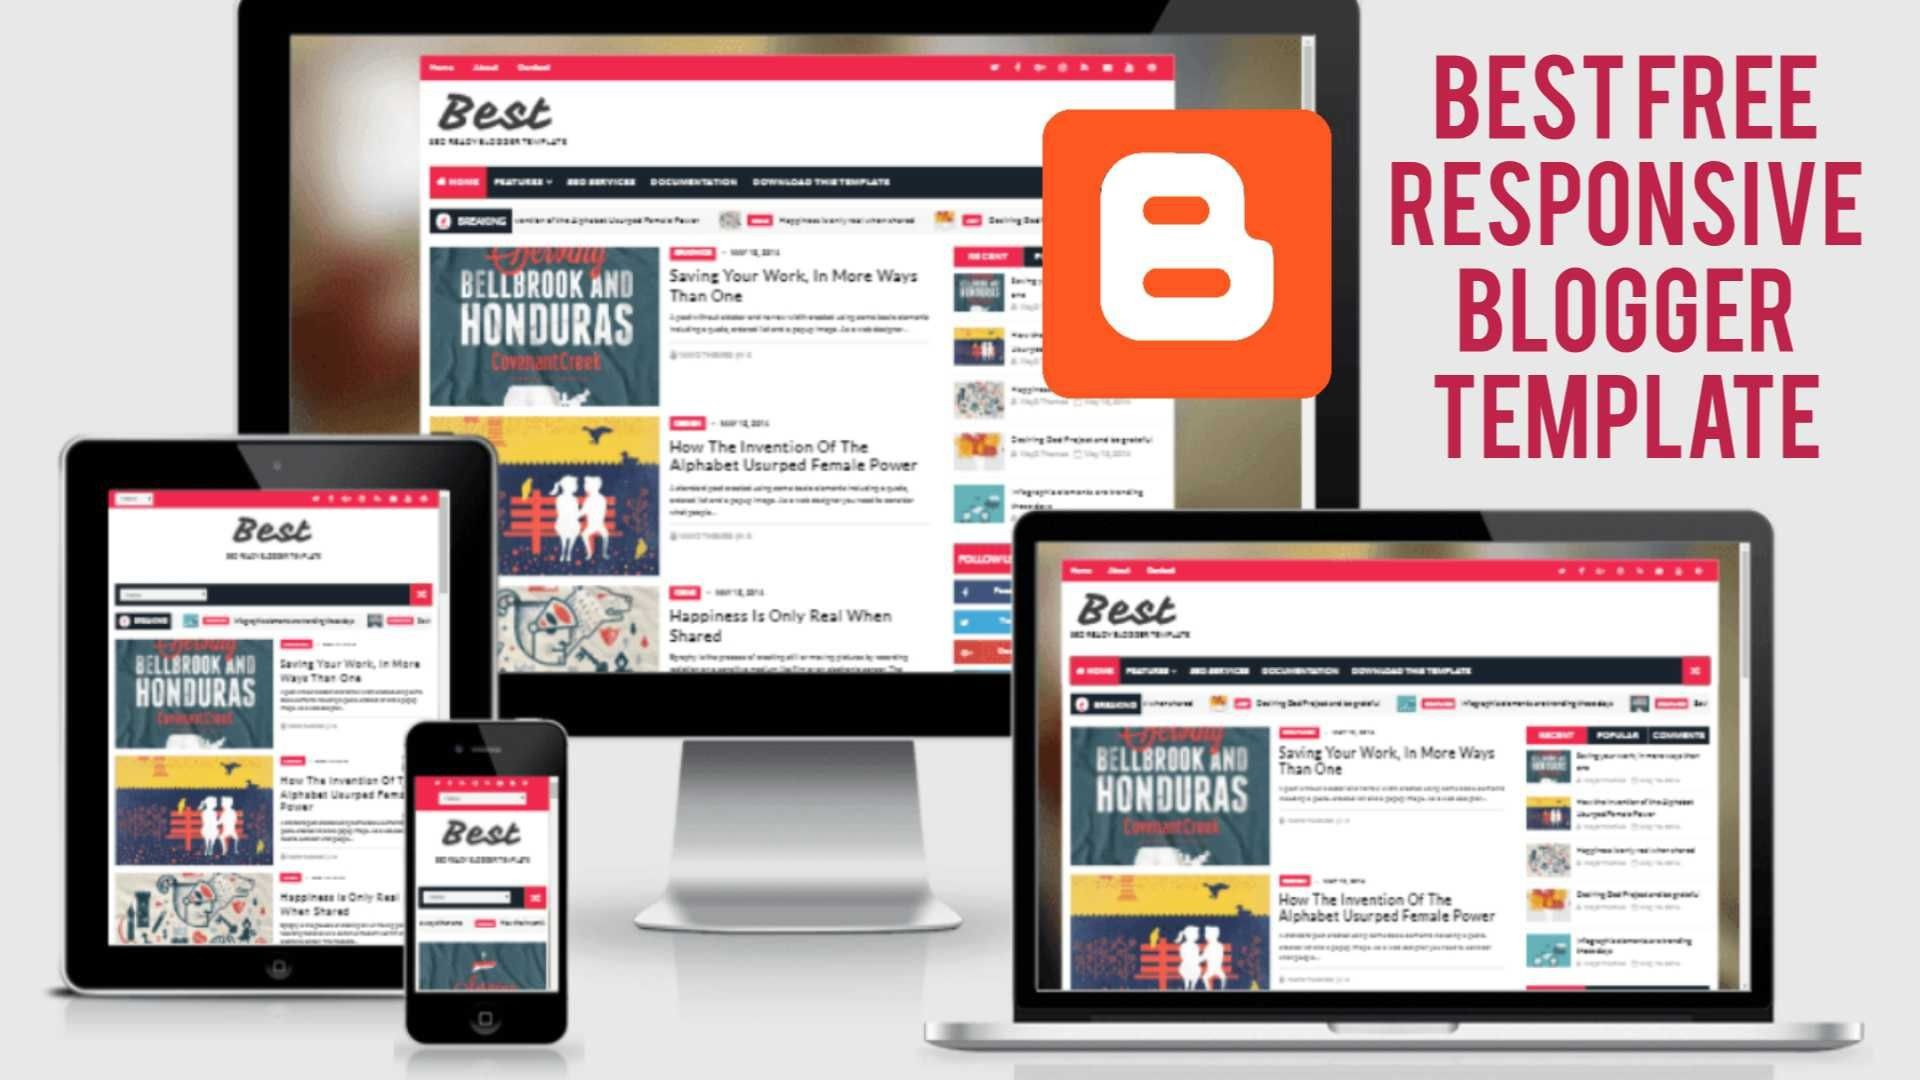 002 Unique Best Free Responsive Blogging Theme Inspiration  Blogger Template 2019 Wordpres Blog Download1920